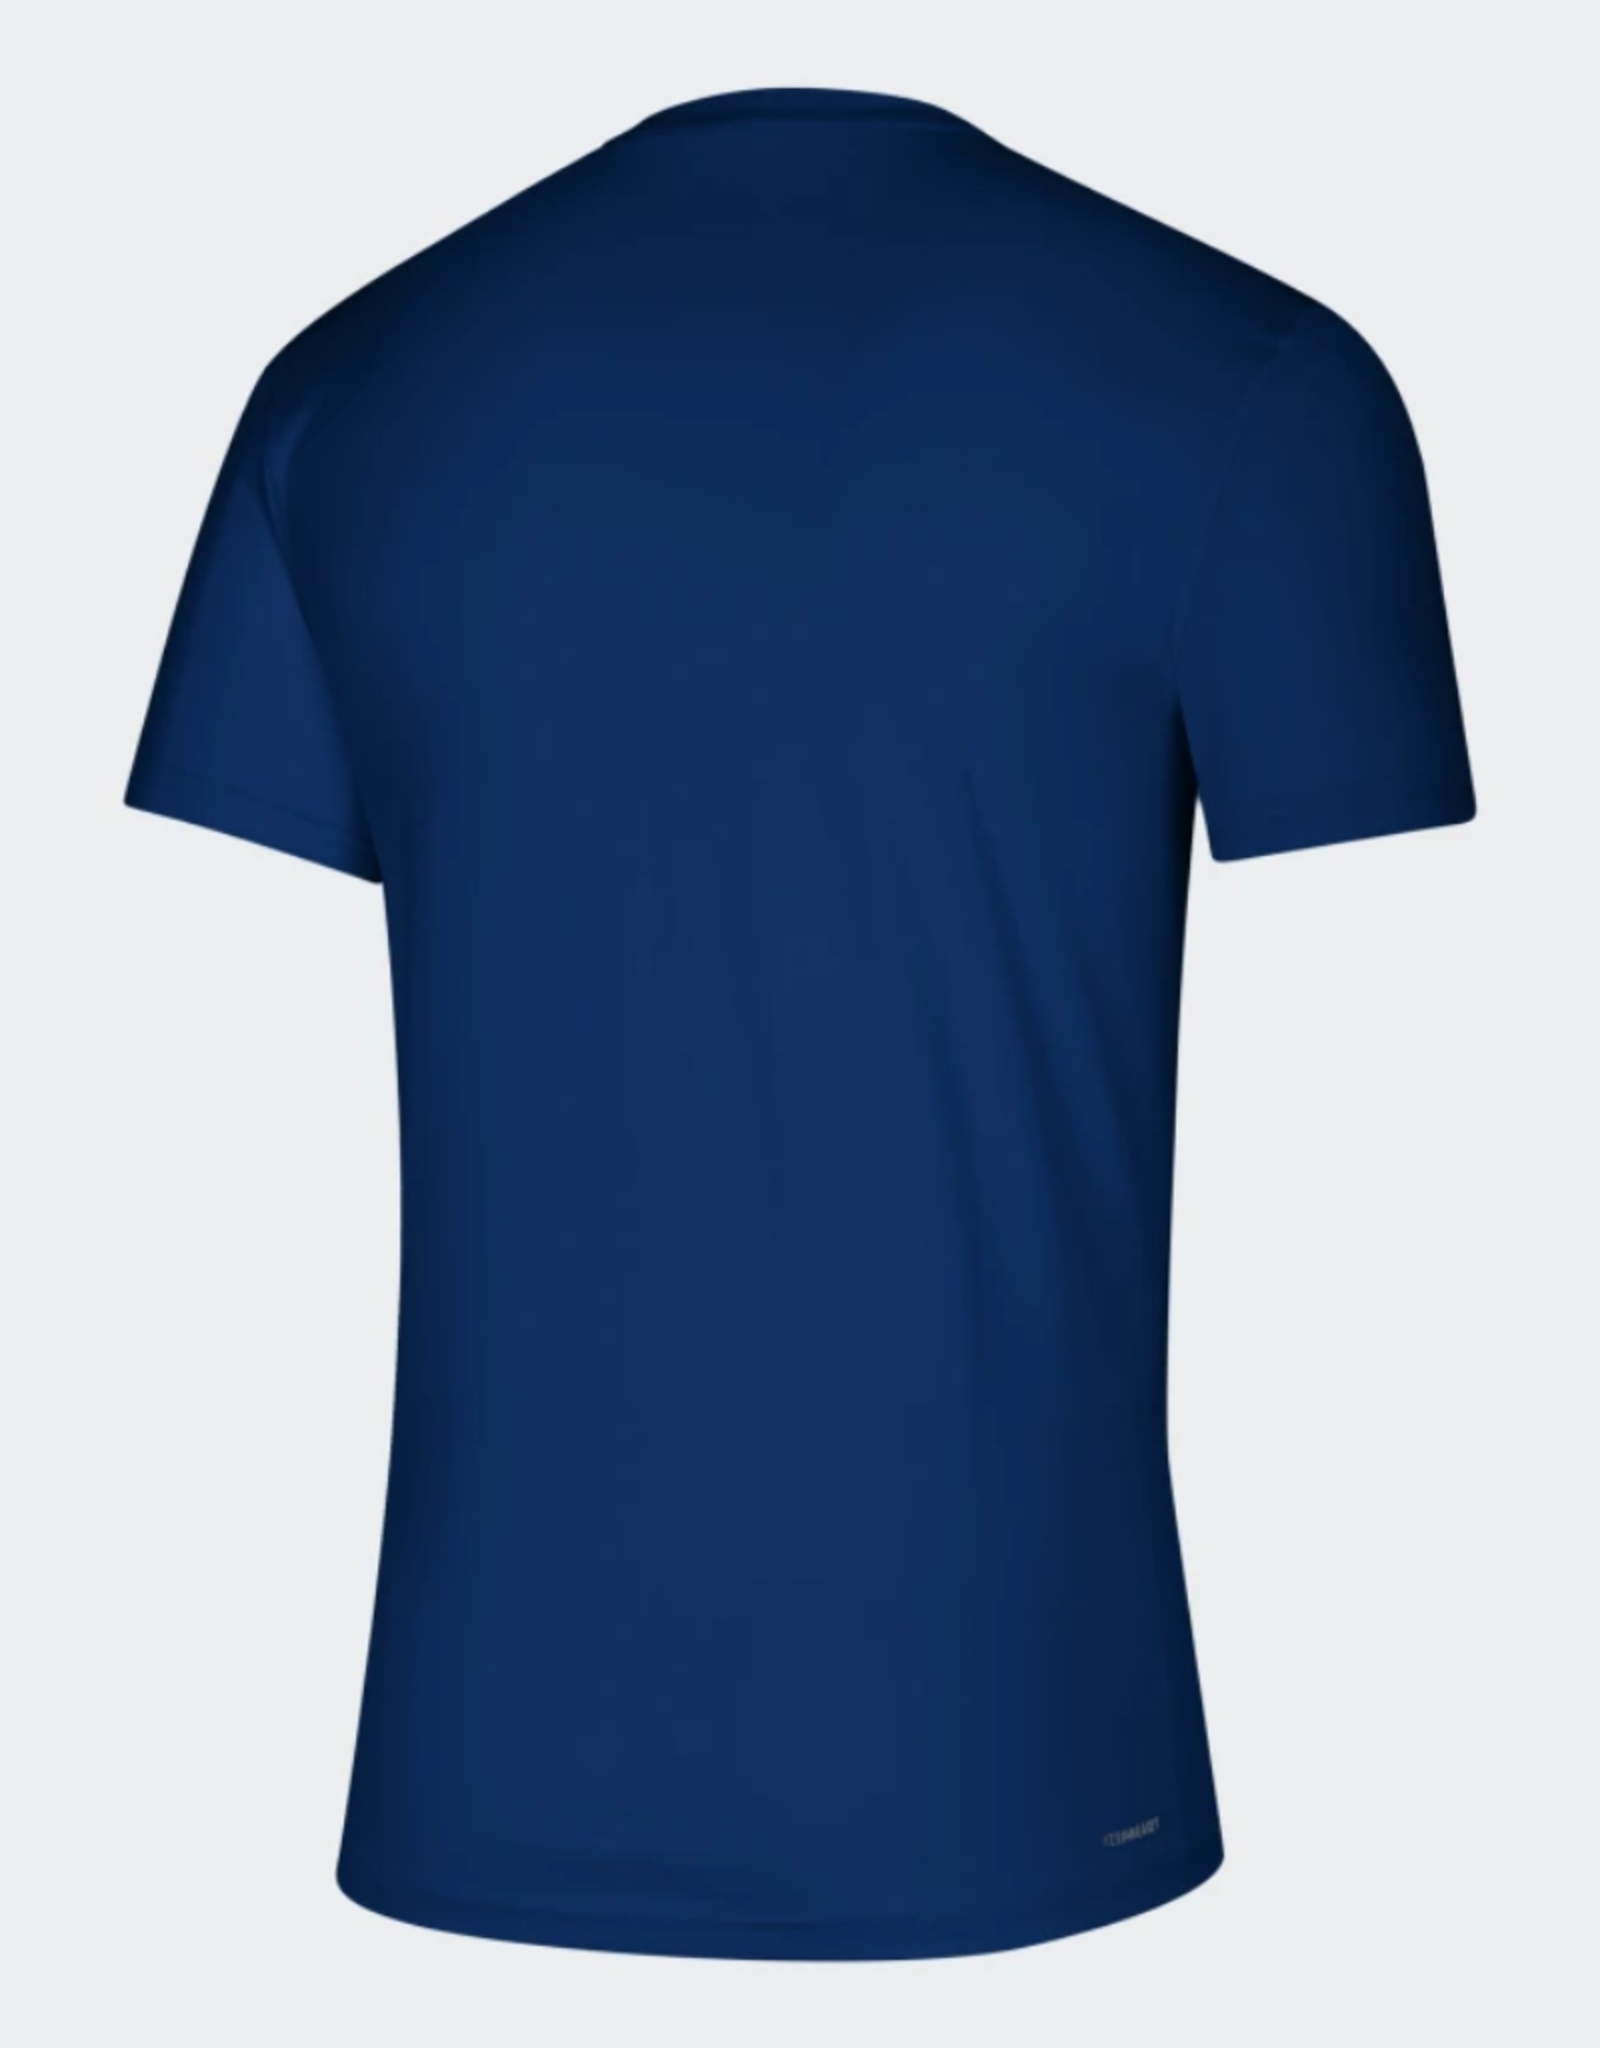 Adidas Adidas Men's Creator T-Shirt Montreal Canadiens Navy